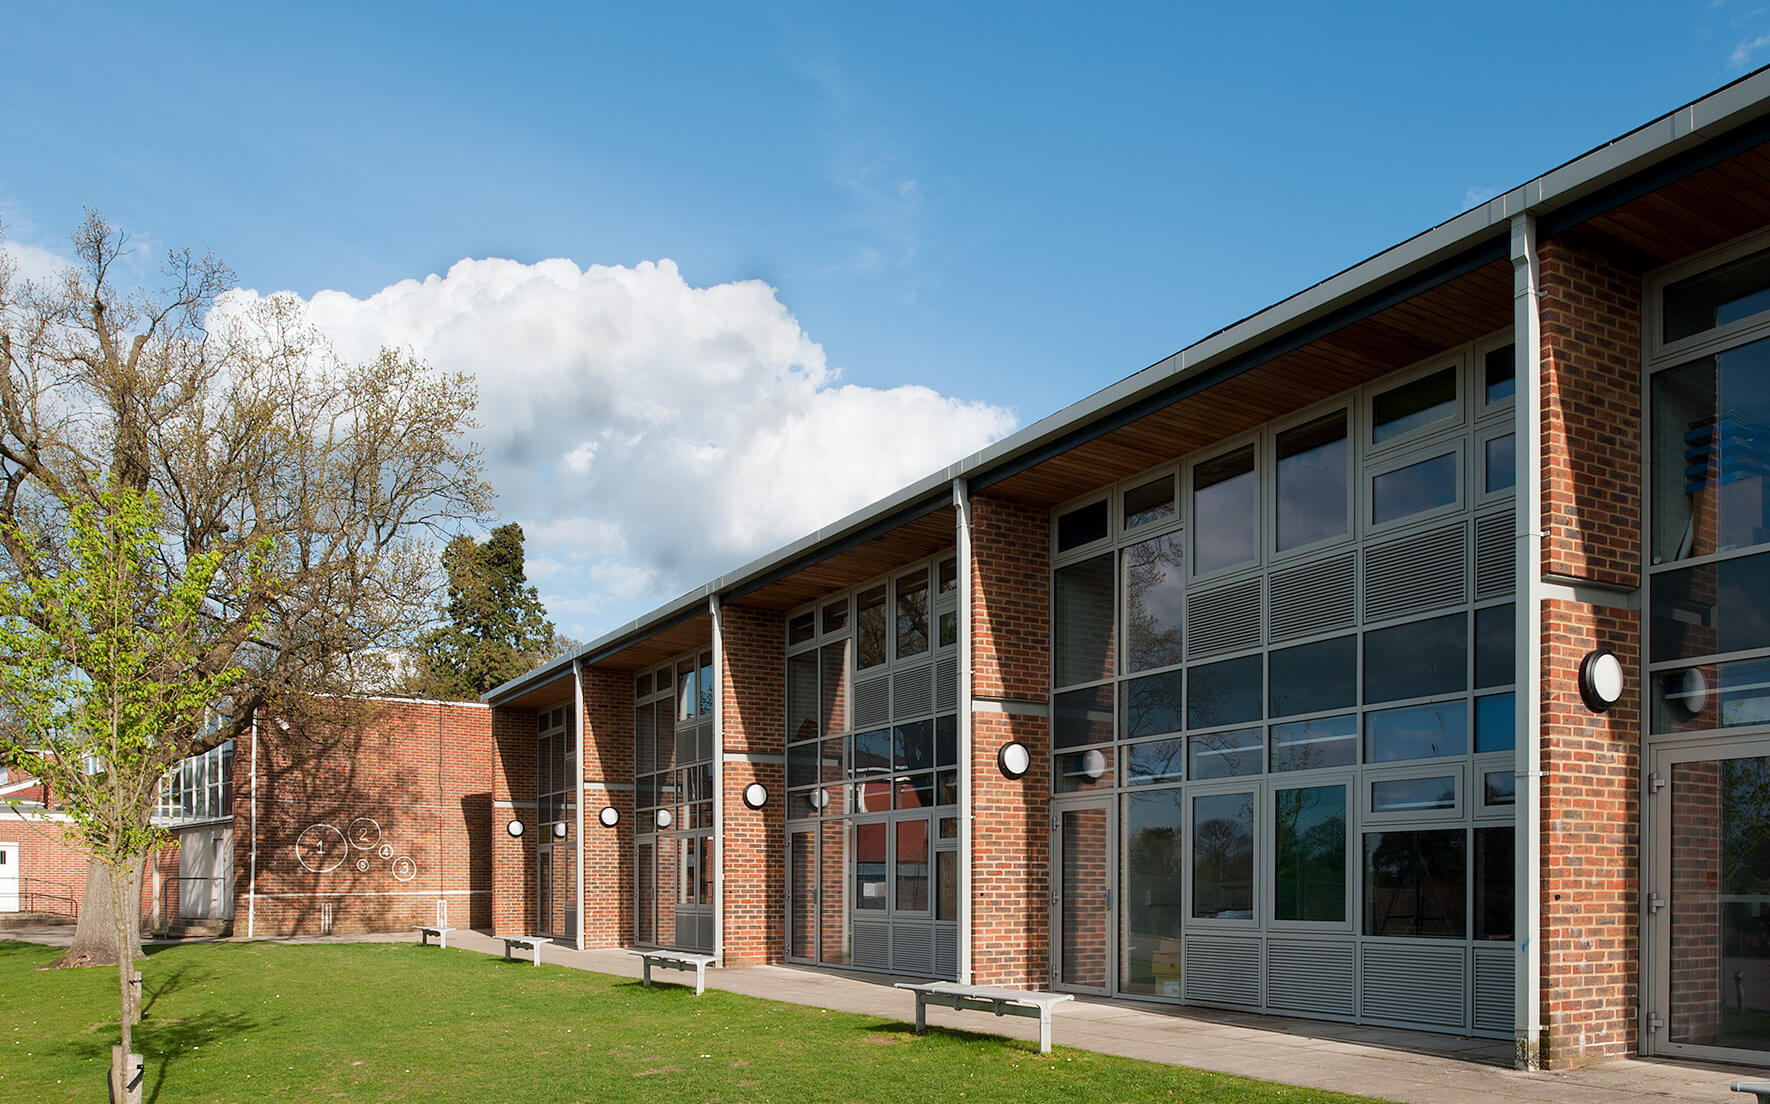 Bennett Memorial Diocesan School Ece Architecture